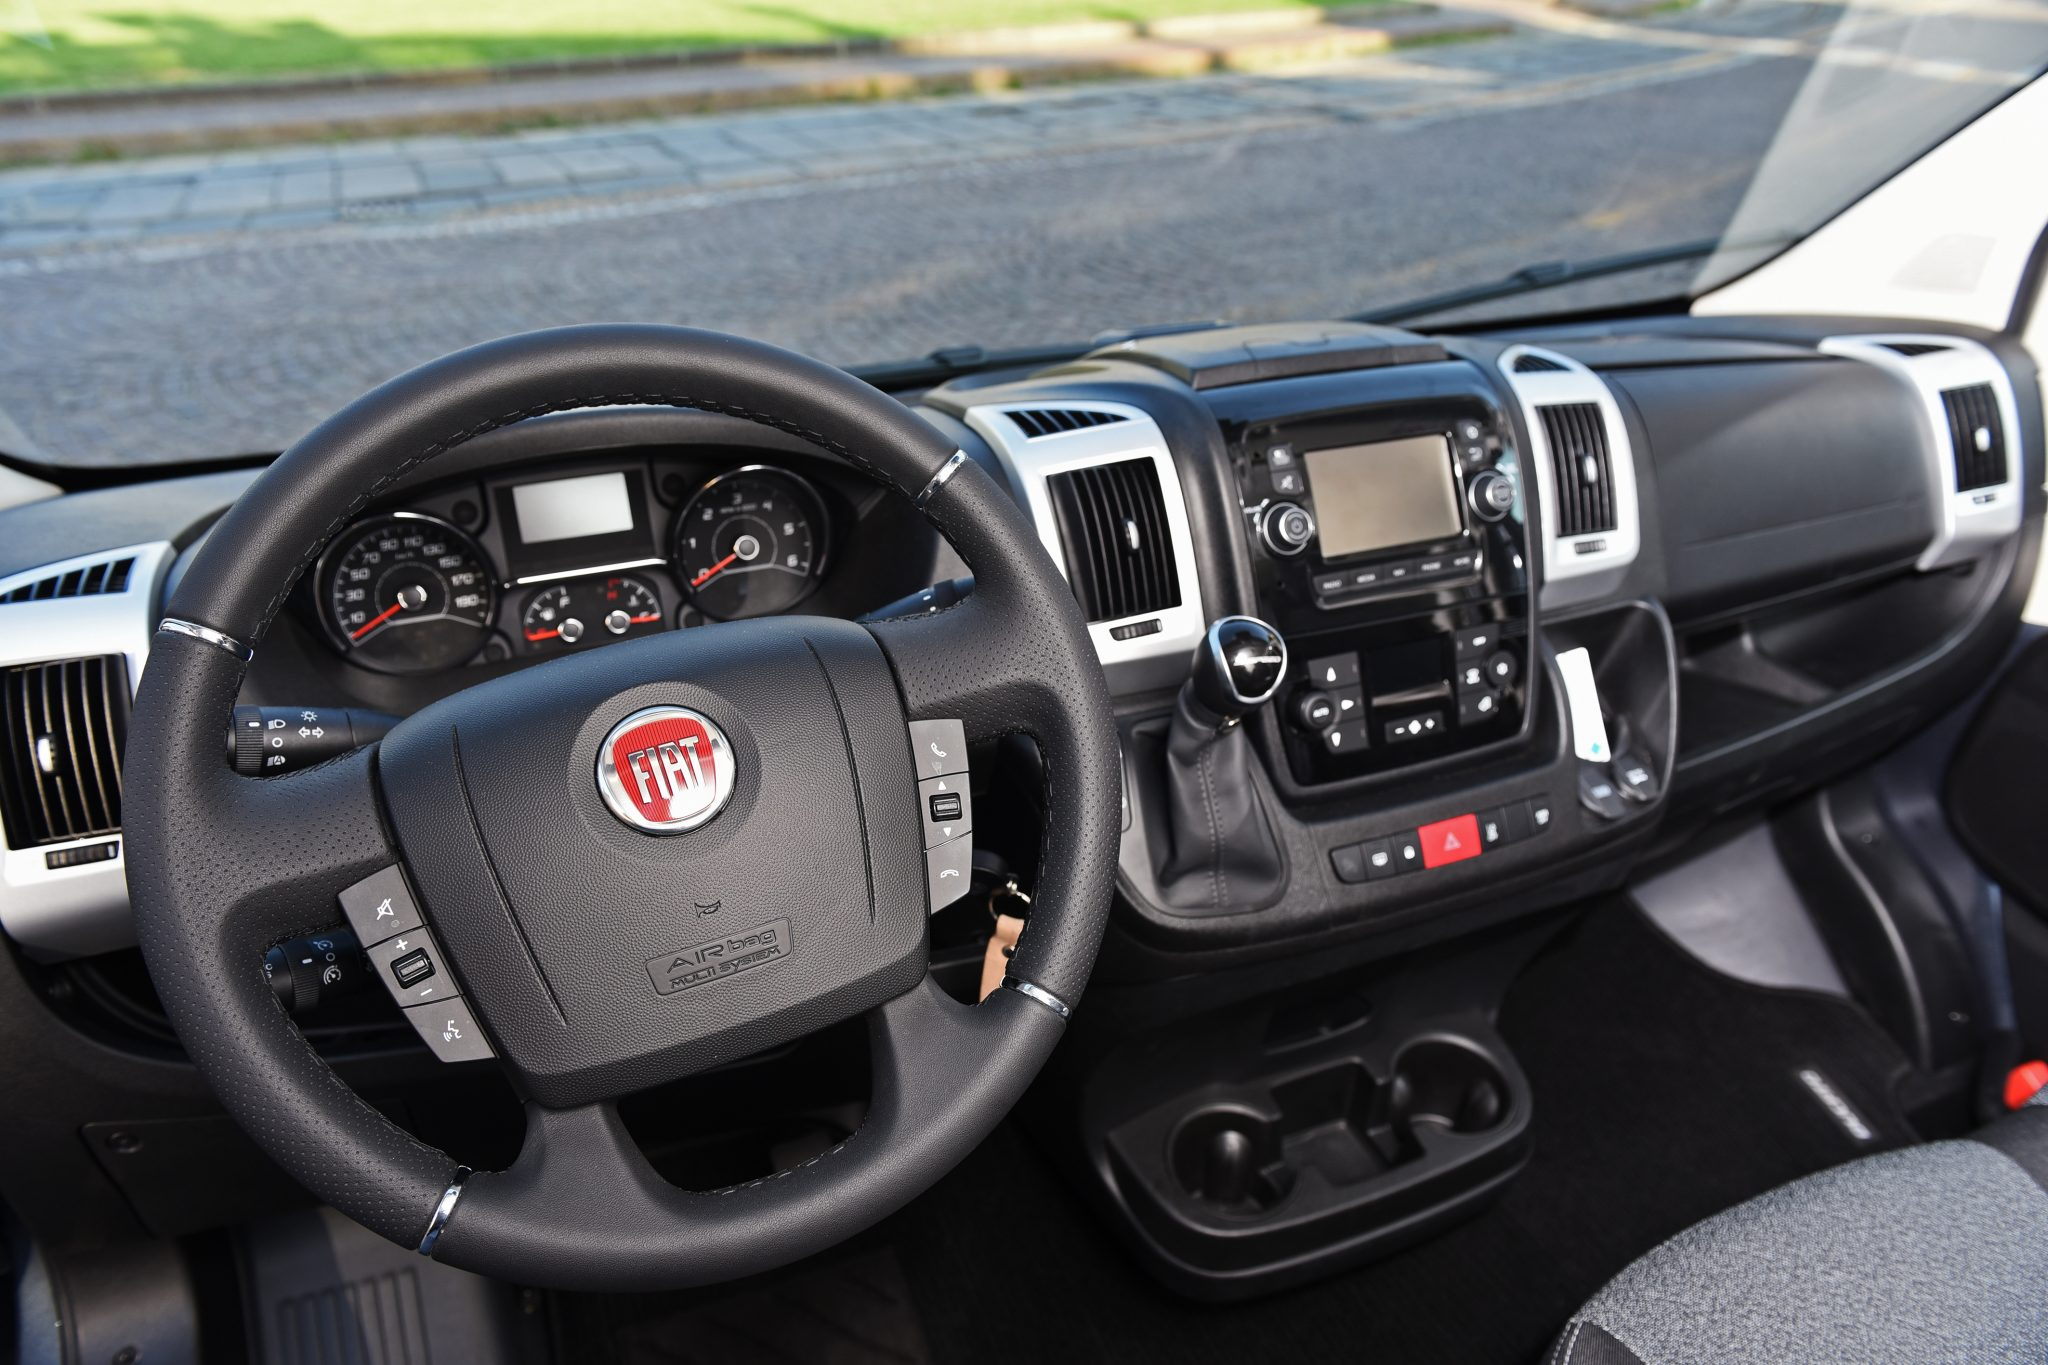 Fiat Ducato 2020 Company Car And Van